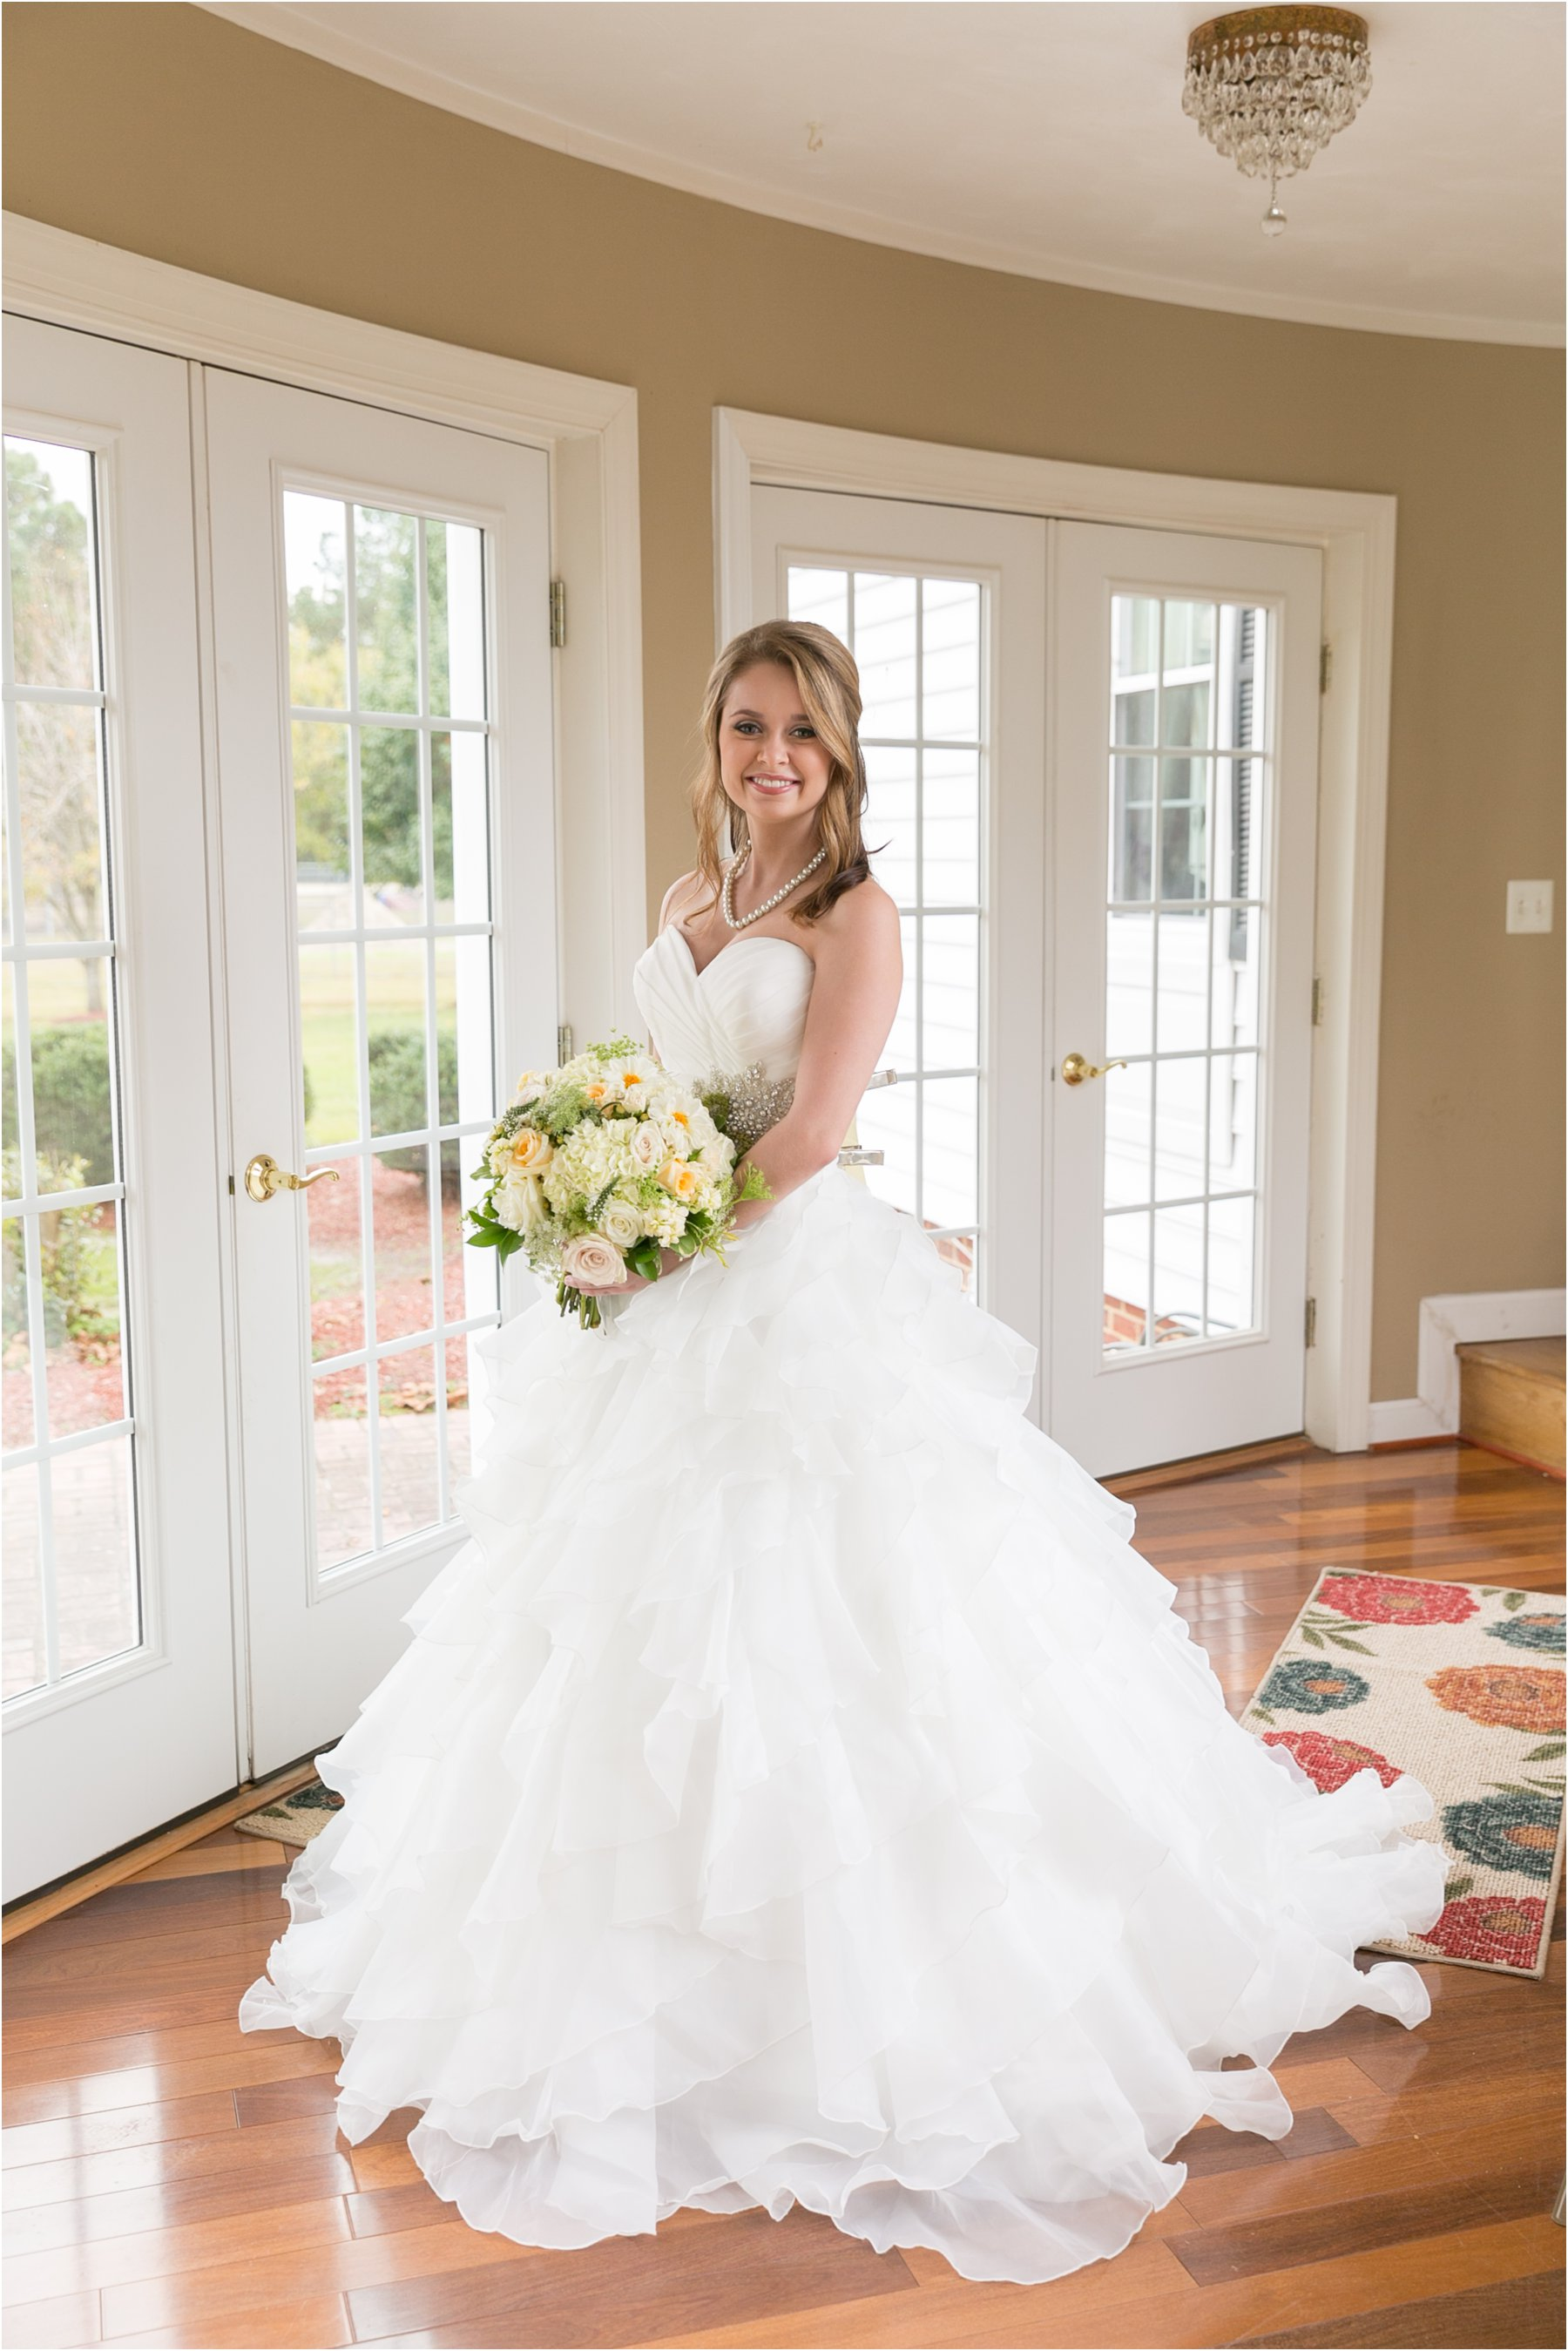 Holly_Ridge_Manor_Wedding_Photography_Jessica_Ryan_Photography_virginia_virginia_beach_0247